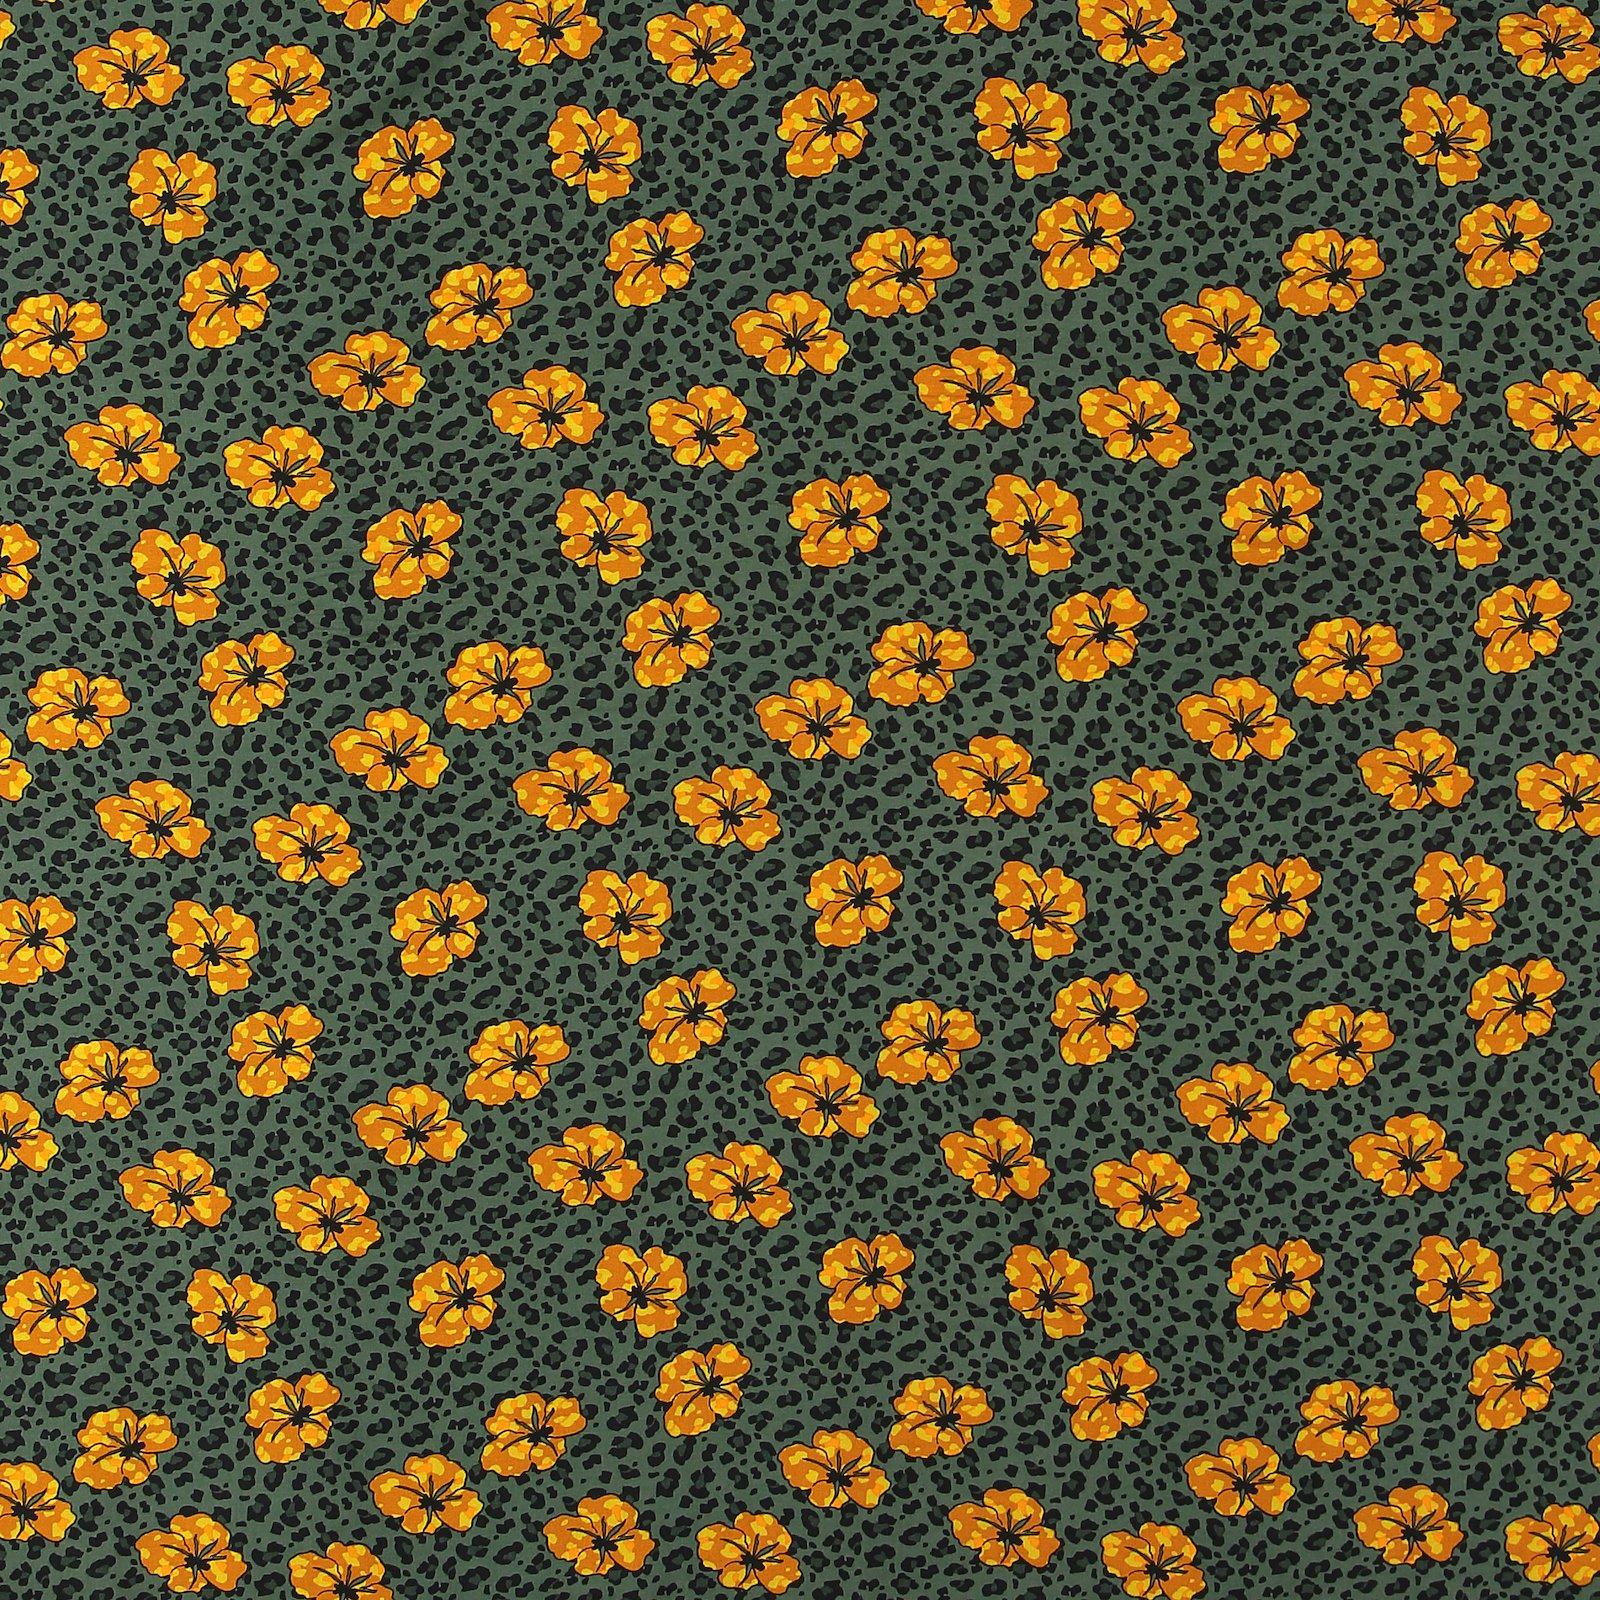 Woven viscose dusty darkgreen leo/flower 710582_pack_sp